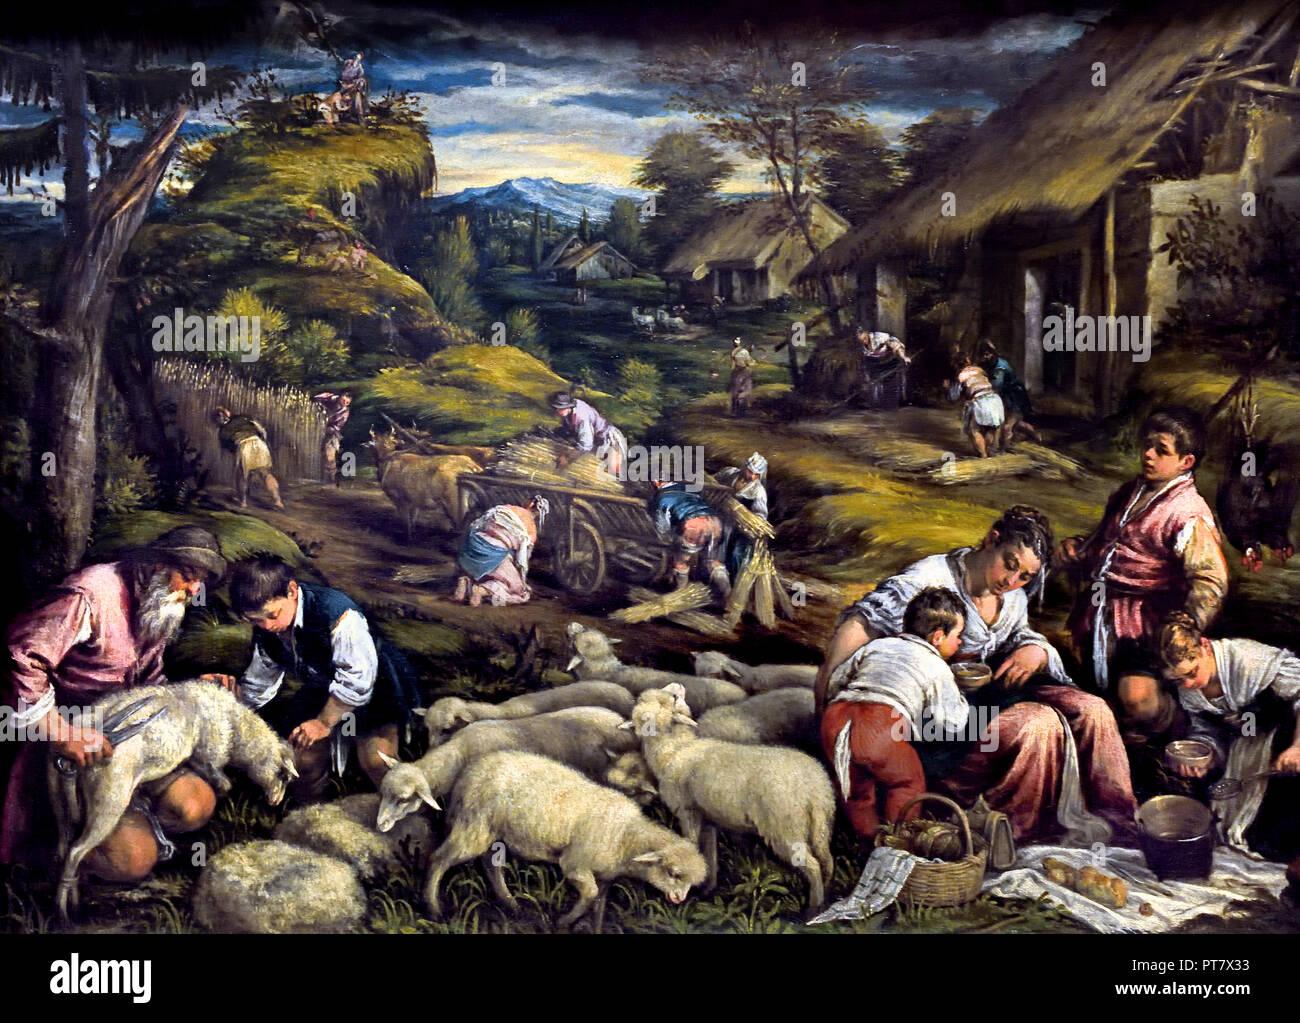 Summer (sacrifice of Isaac) 1576 Francesco da Ponte, called, Francesco Bassano, (1549 - 1592 ) , Italy, Italian. ( God asks Abraham to sacrifice his son, Isaac, on Moriah ) - Stock Image